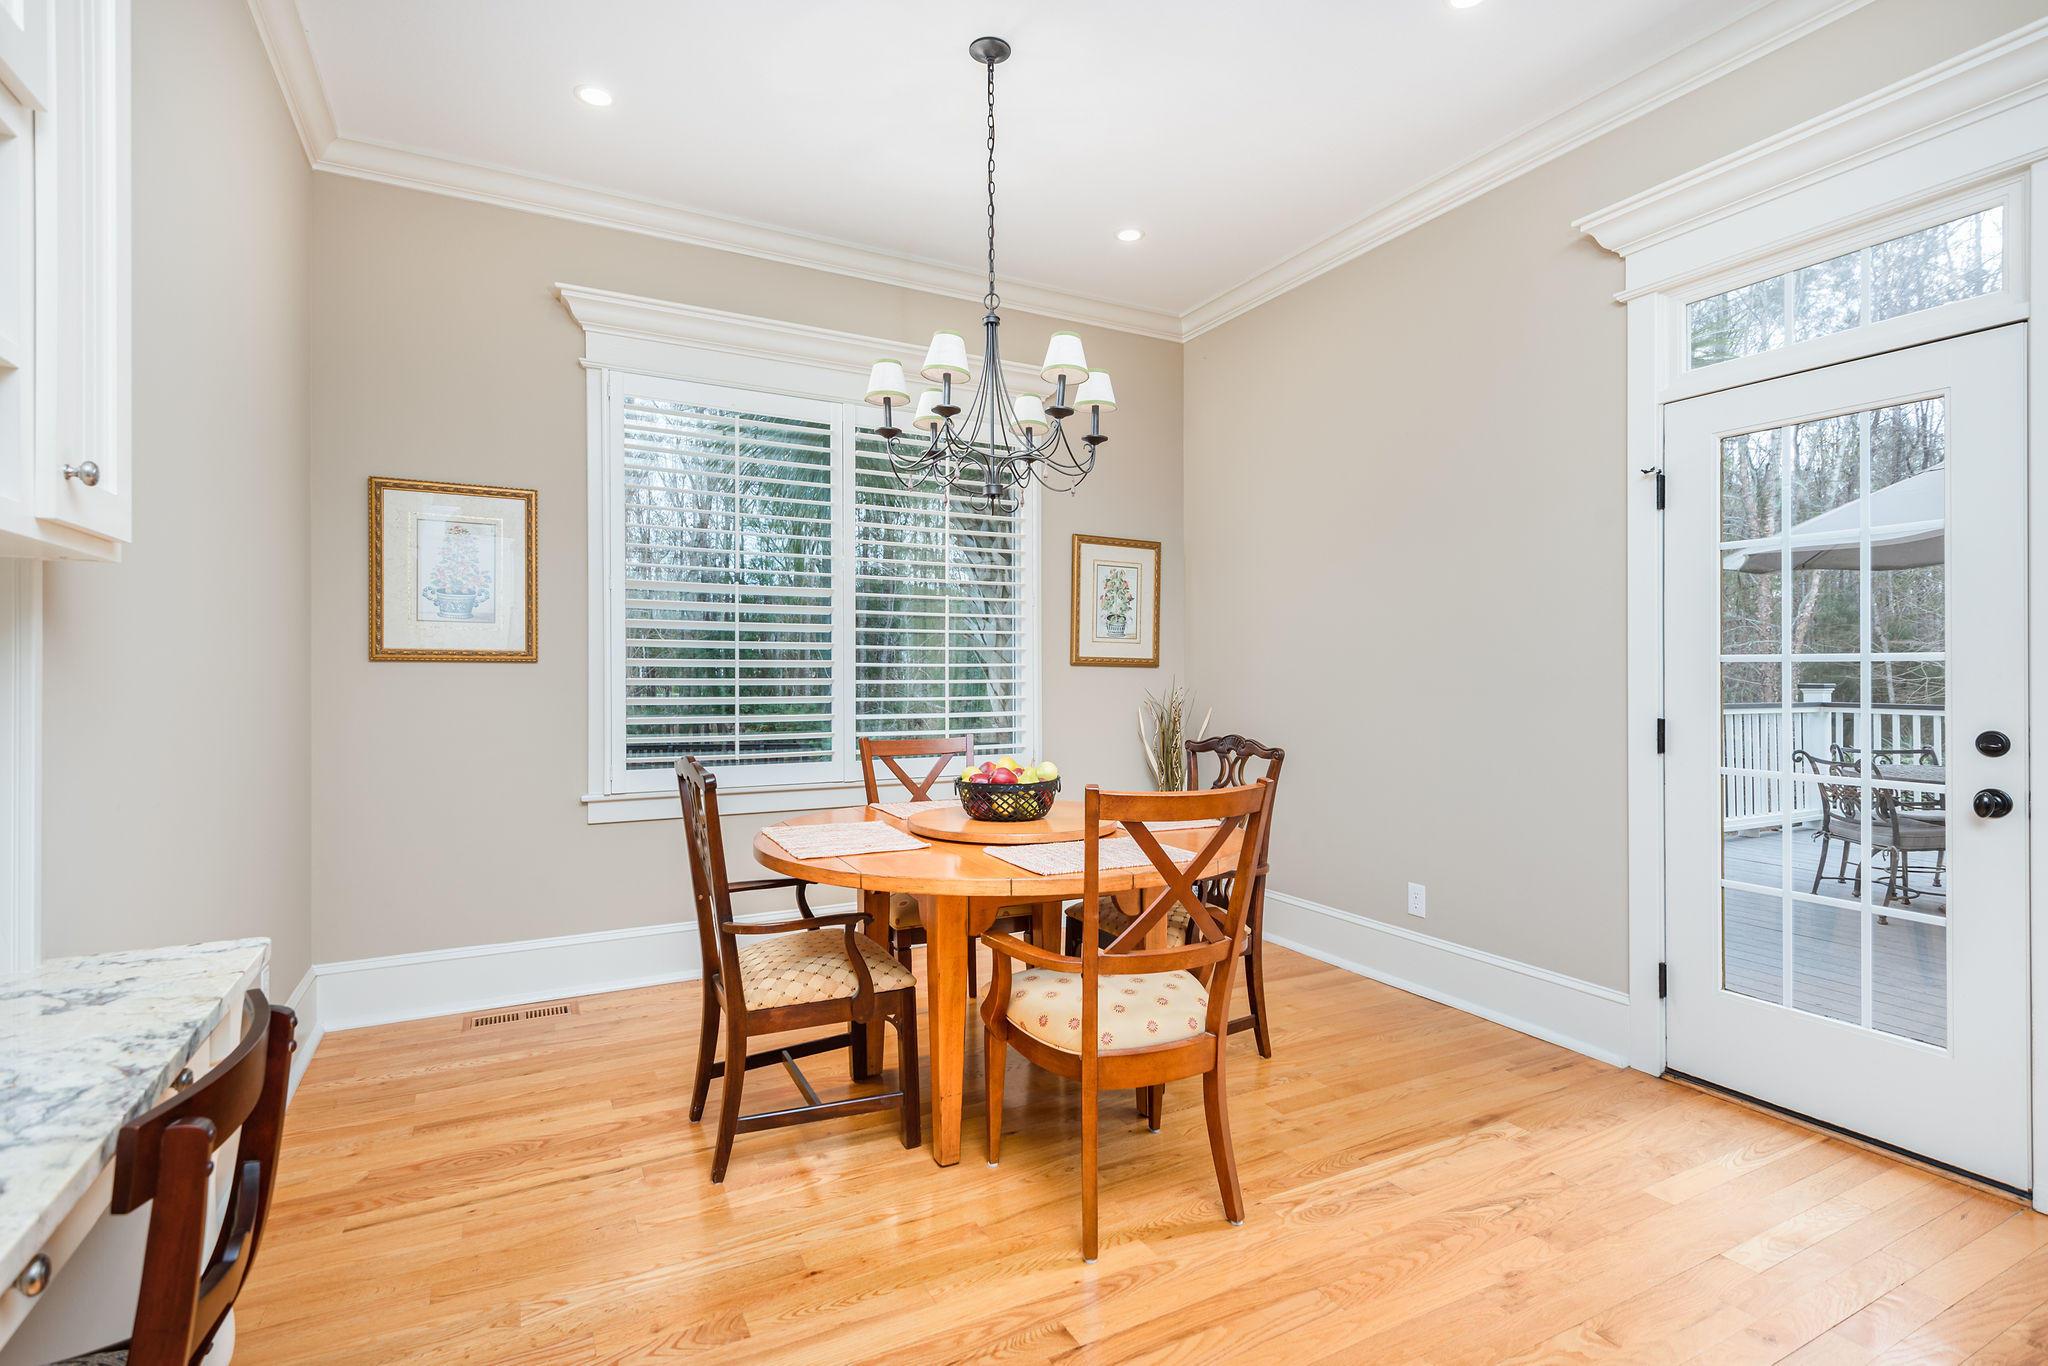 Dunes West Homes For Sale - 1305 King Bird, Mount Pleasant, SC - 51